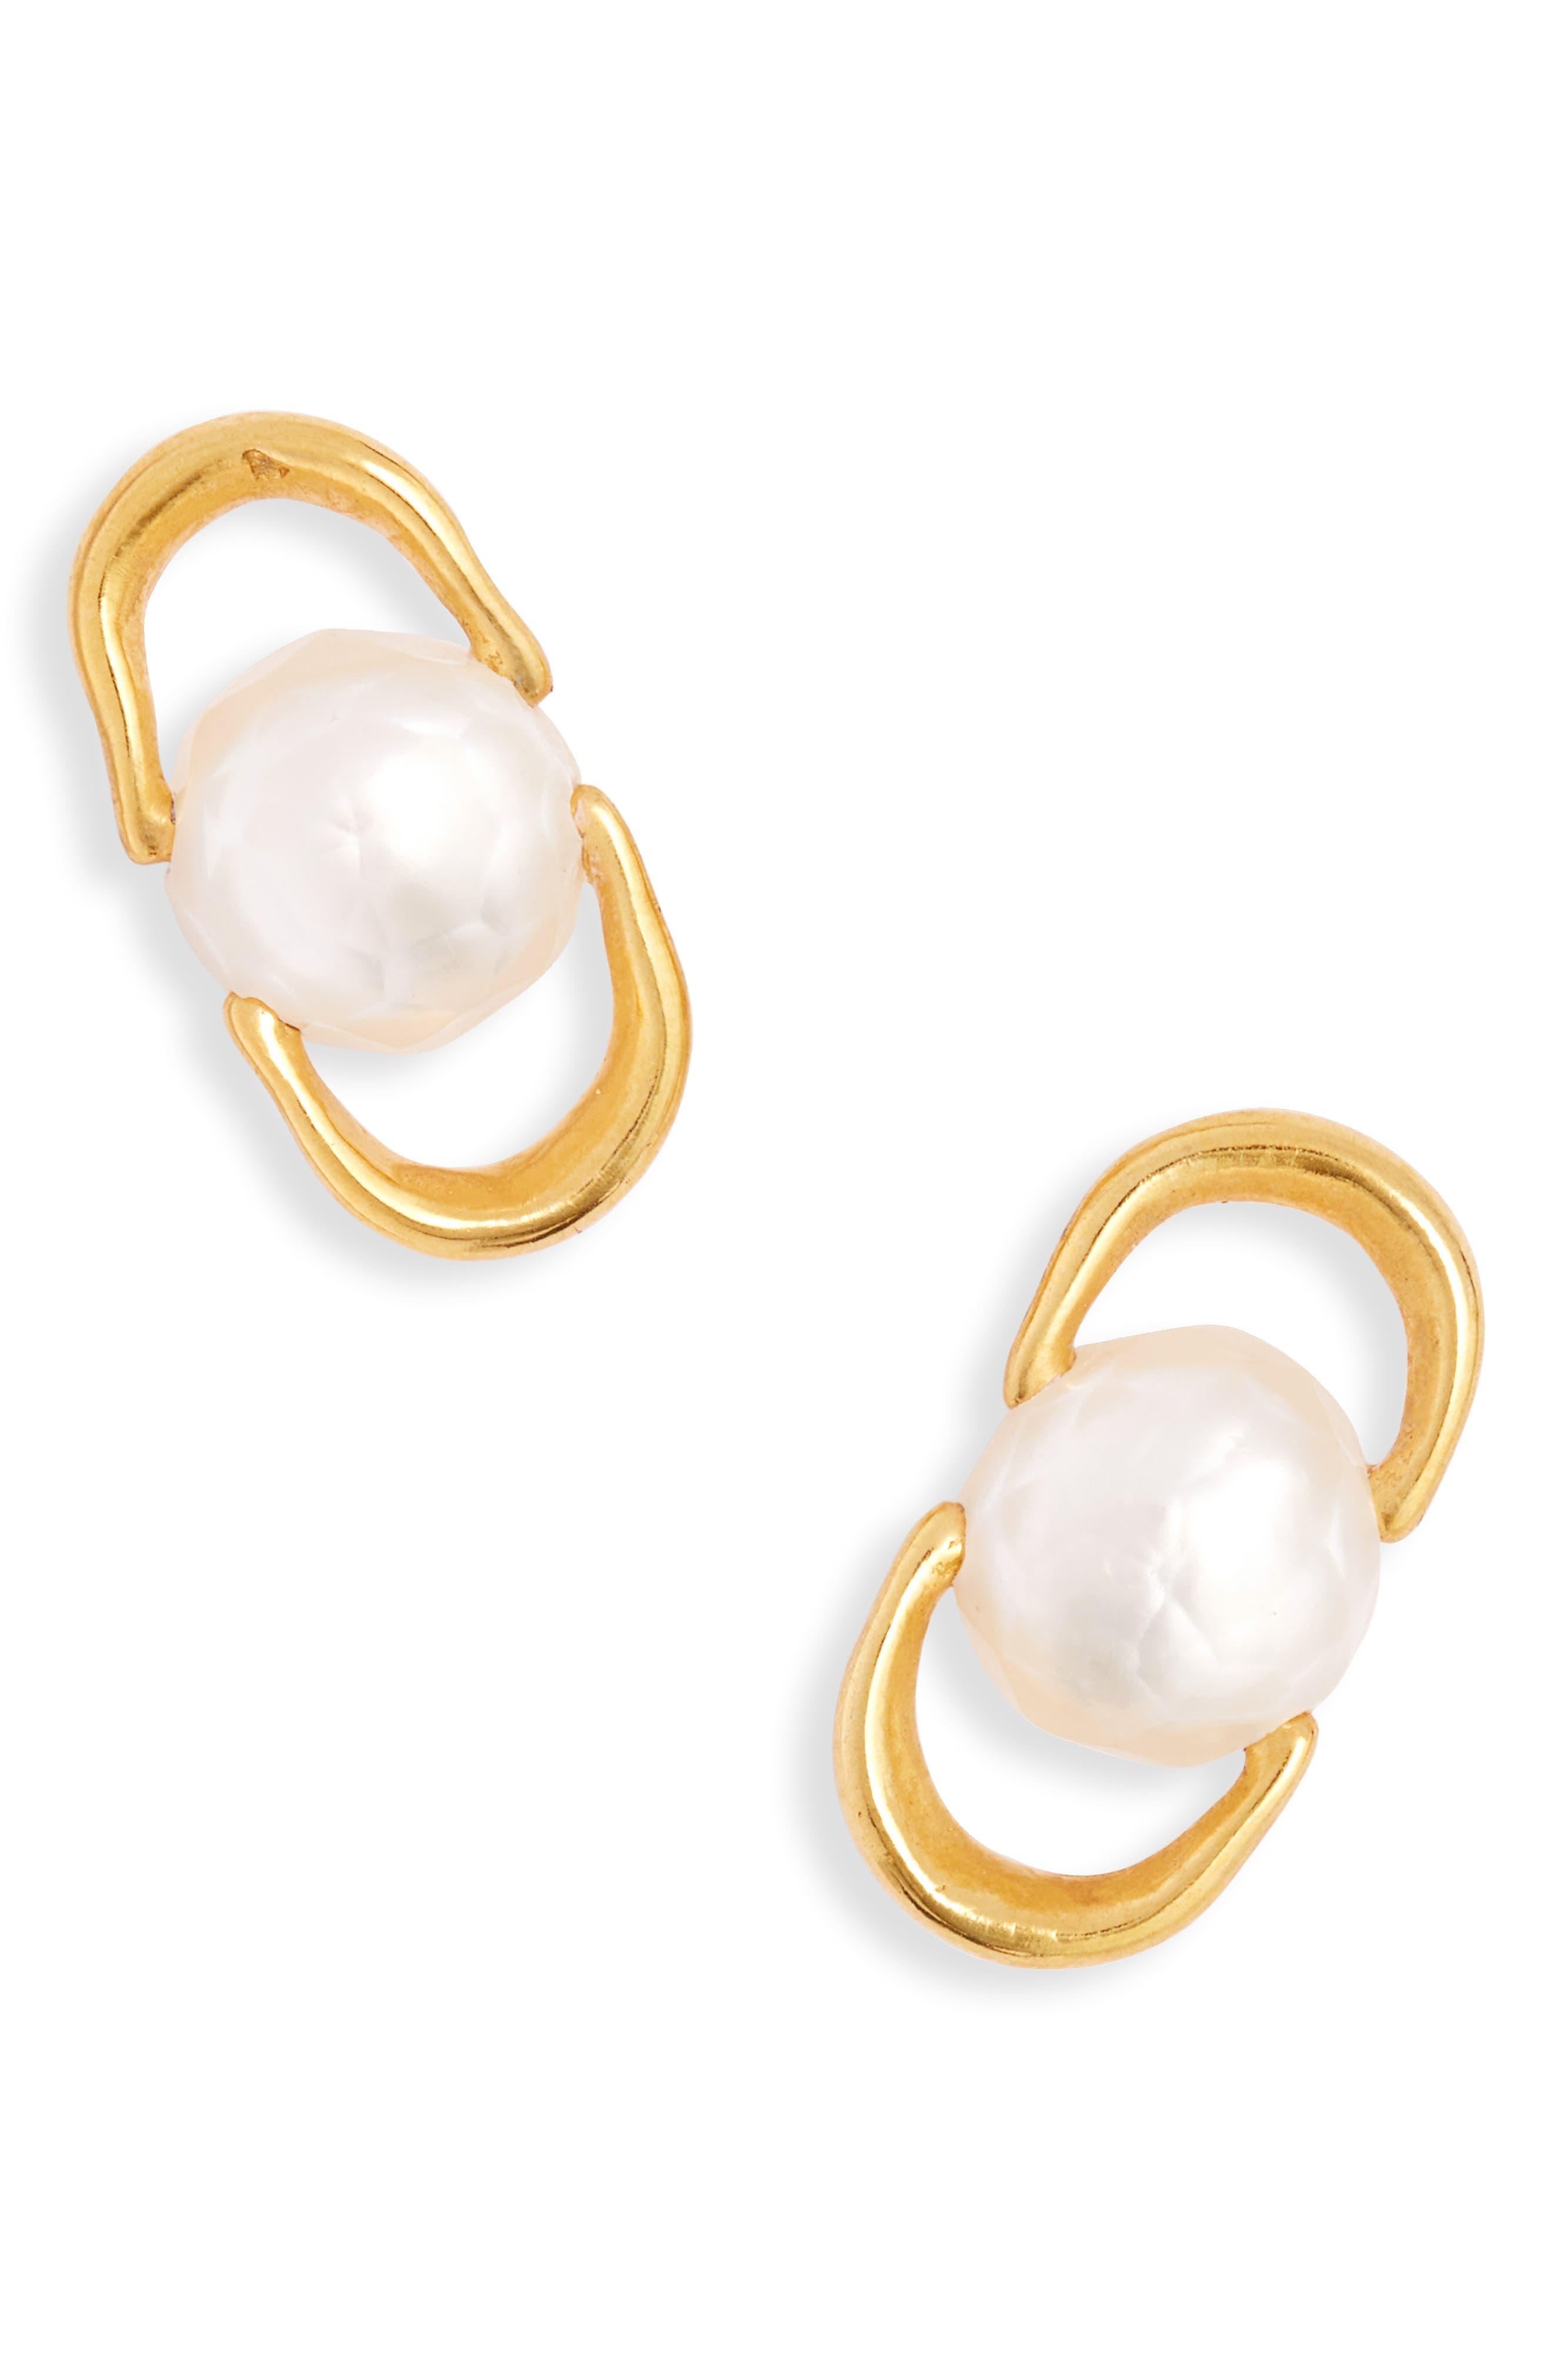 White Baroque Pearl Vermeil Chain Link Earrings